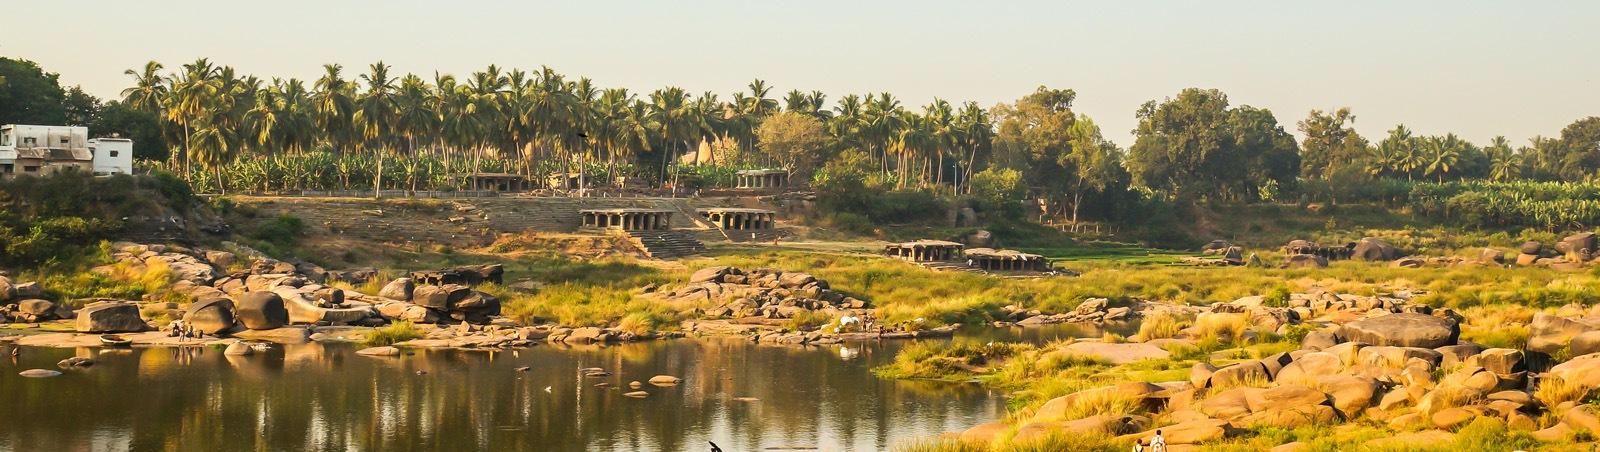 City Culture and Chill Tour - Karnataka and Goa